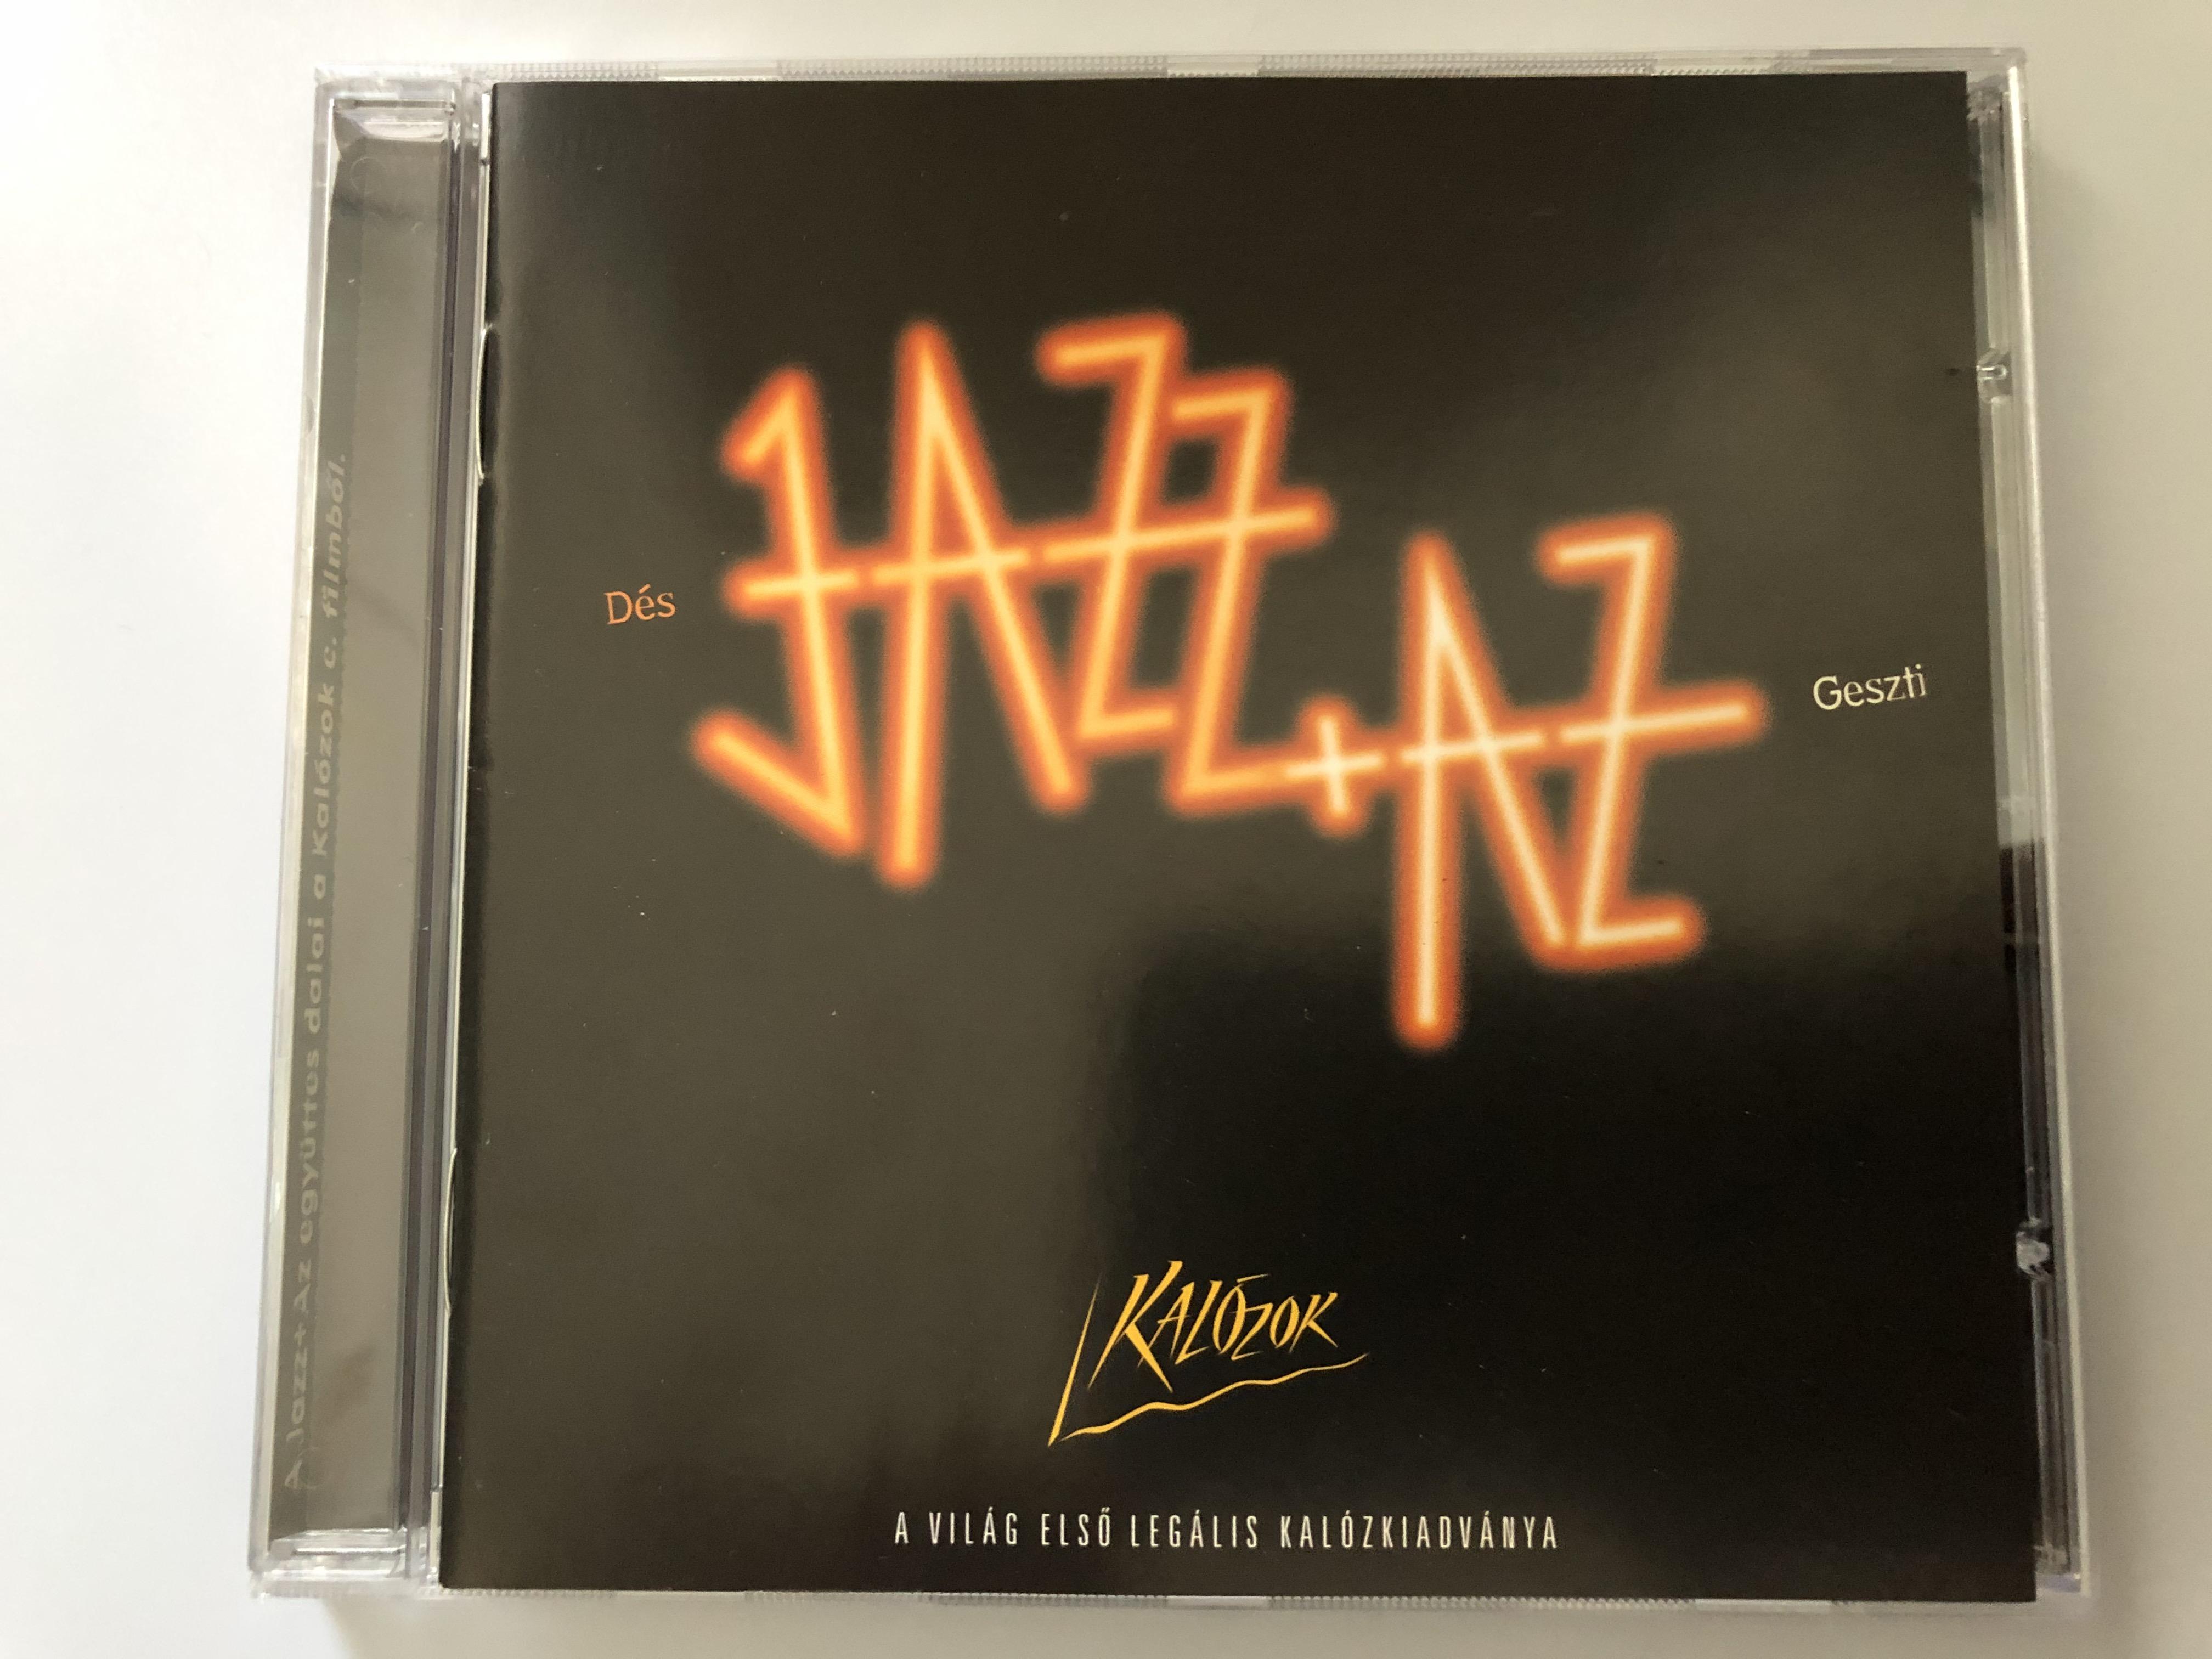 d-s-geszti-jazz-az-kal-zok-budapest-music-center-records-audio-cd-1998-bmc-cd-016-1-.jpg